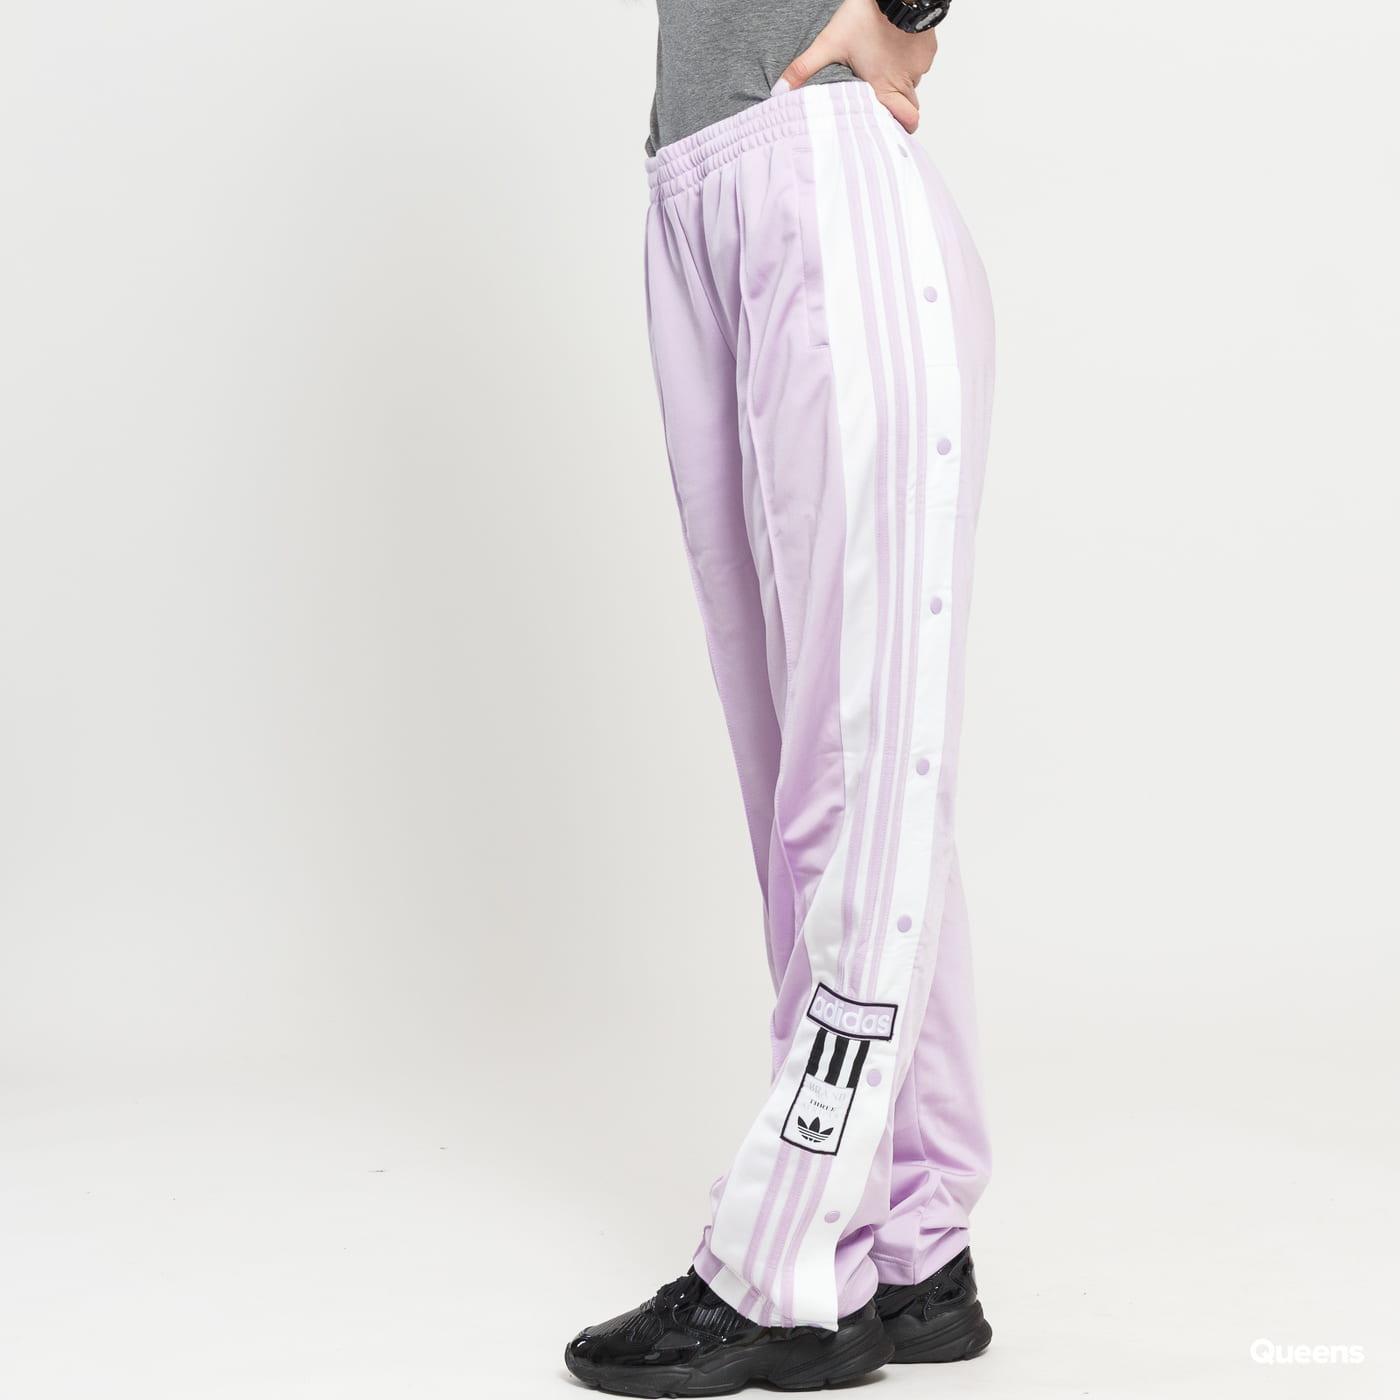 b269b8c661 adidas Originals Adibreak Pant purple